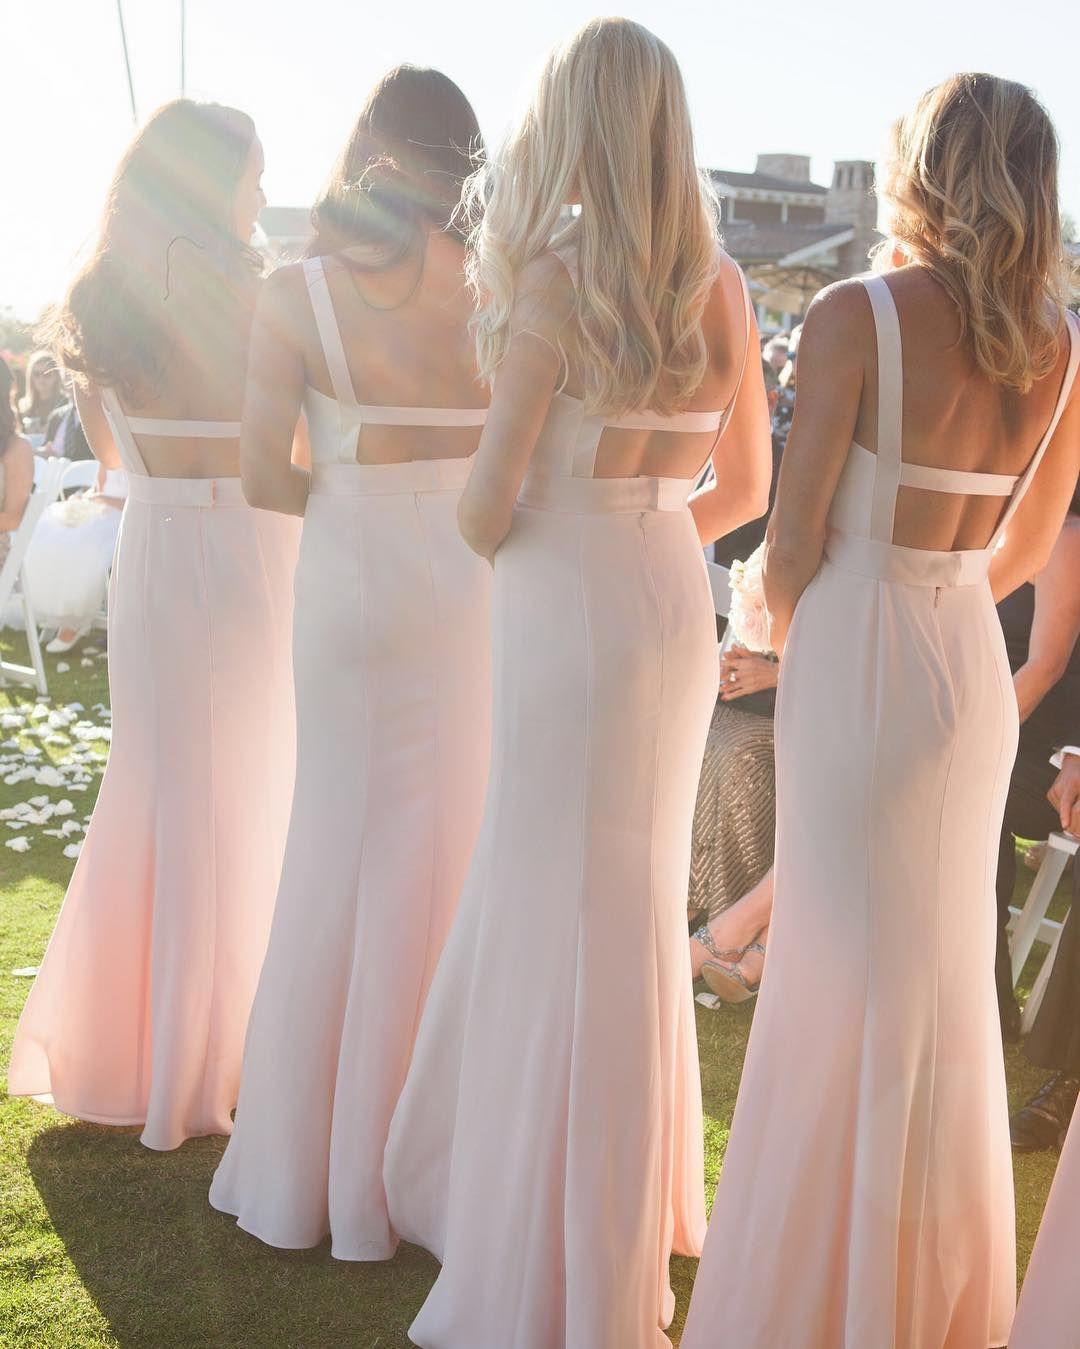 Long V Neck Crepe Gown With Open Back David S Bridal Blush Bridesmaid Dresses Long Davids Bridal Bridesmaid Dresses Blush Pink Bridesmaid Dresses